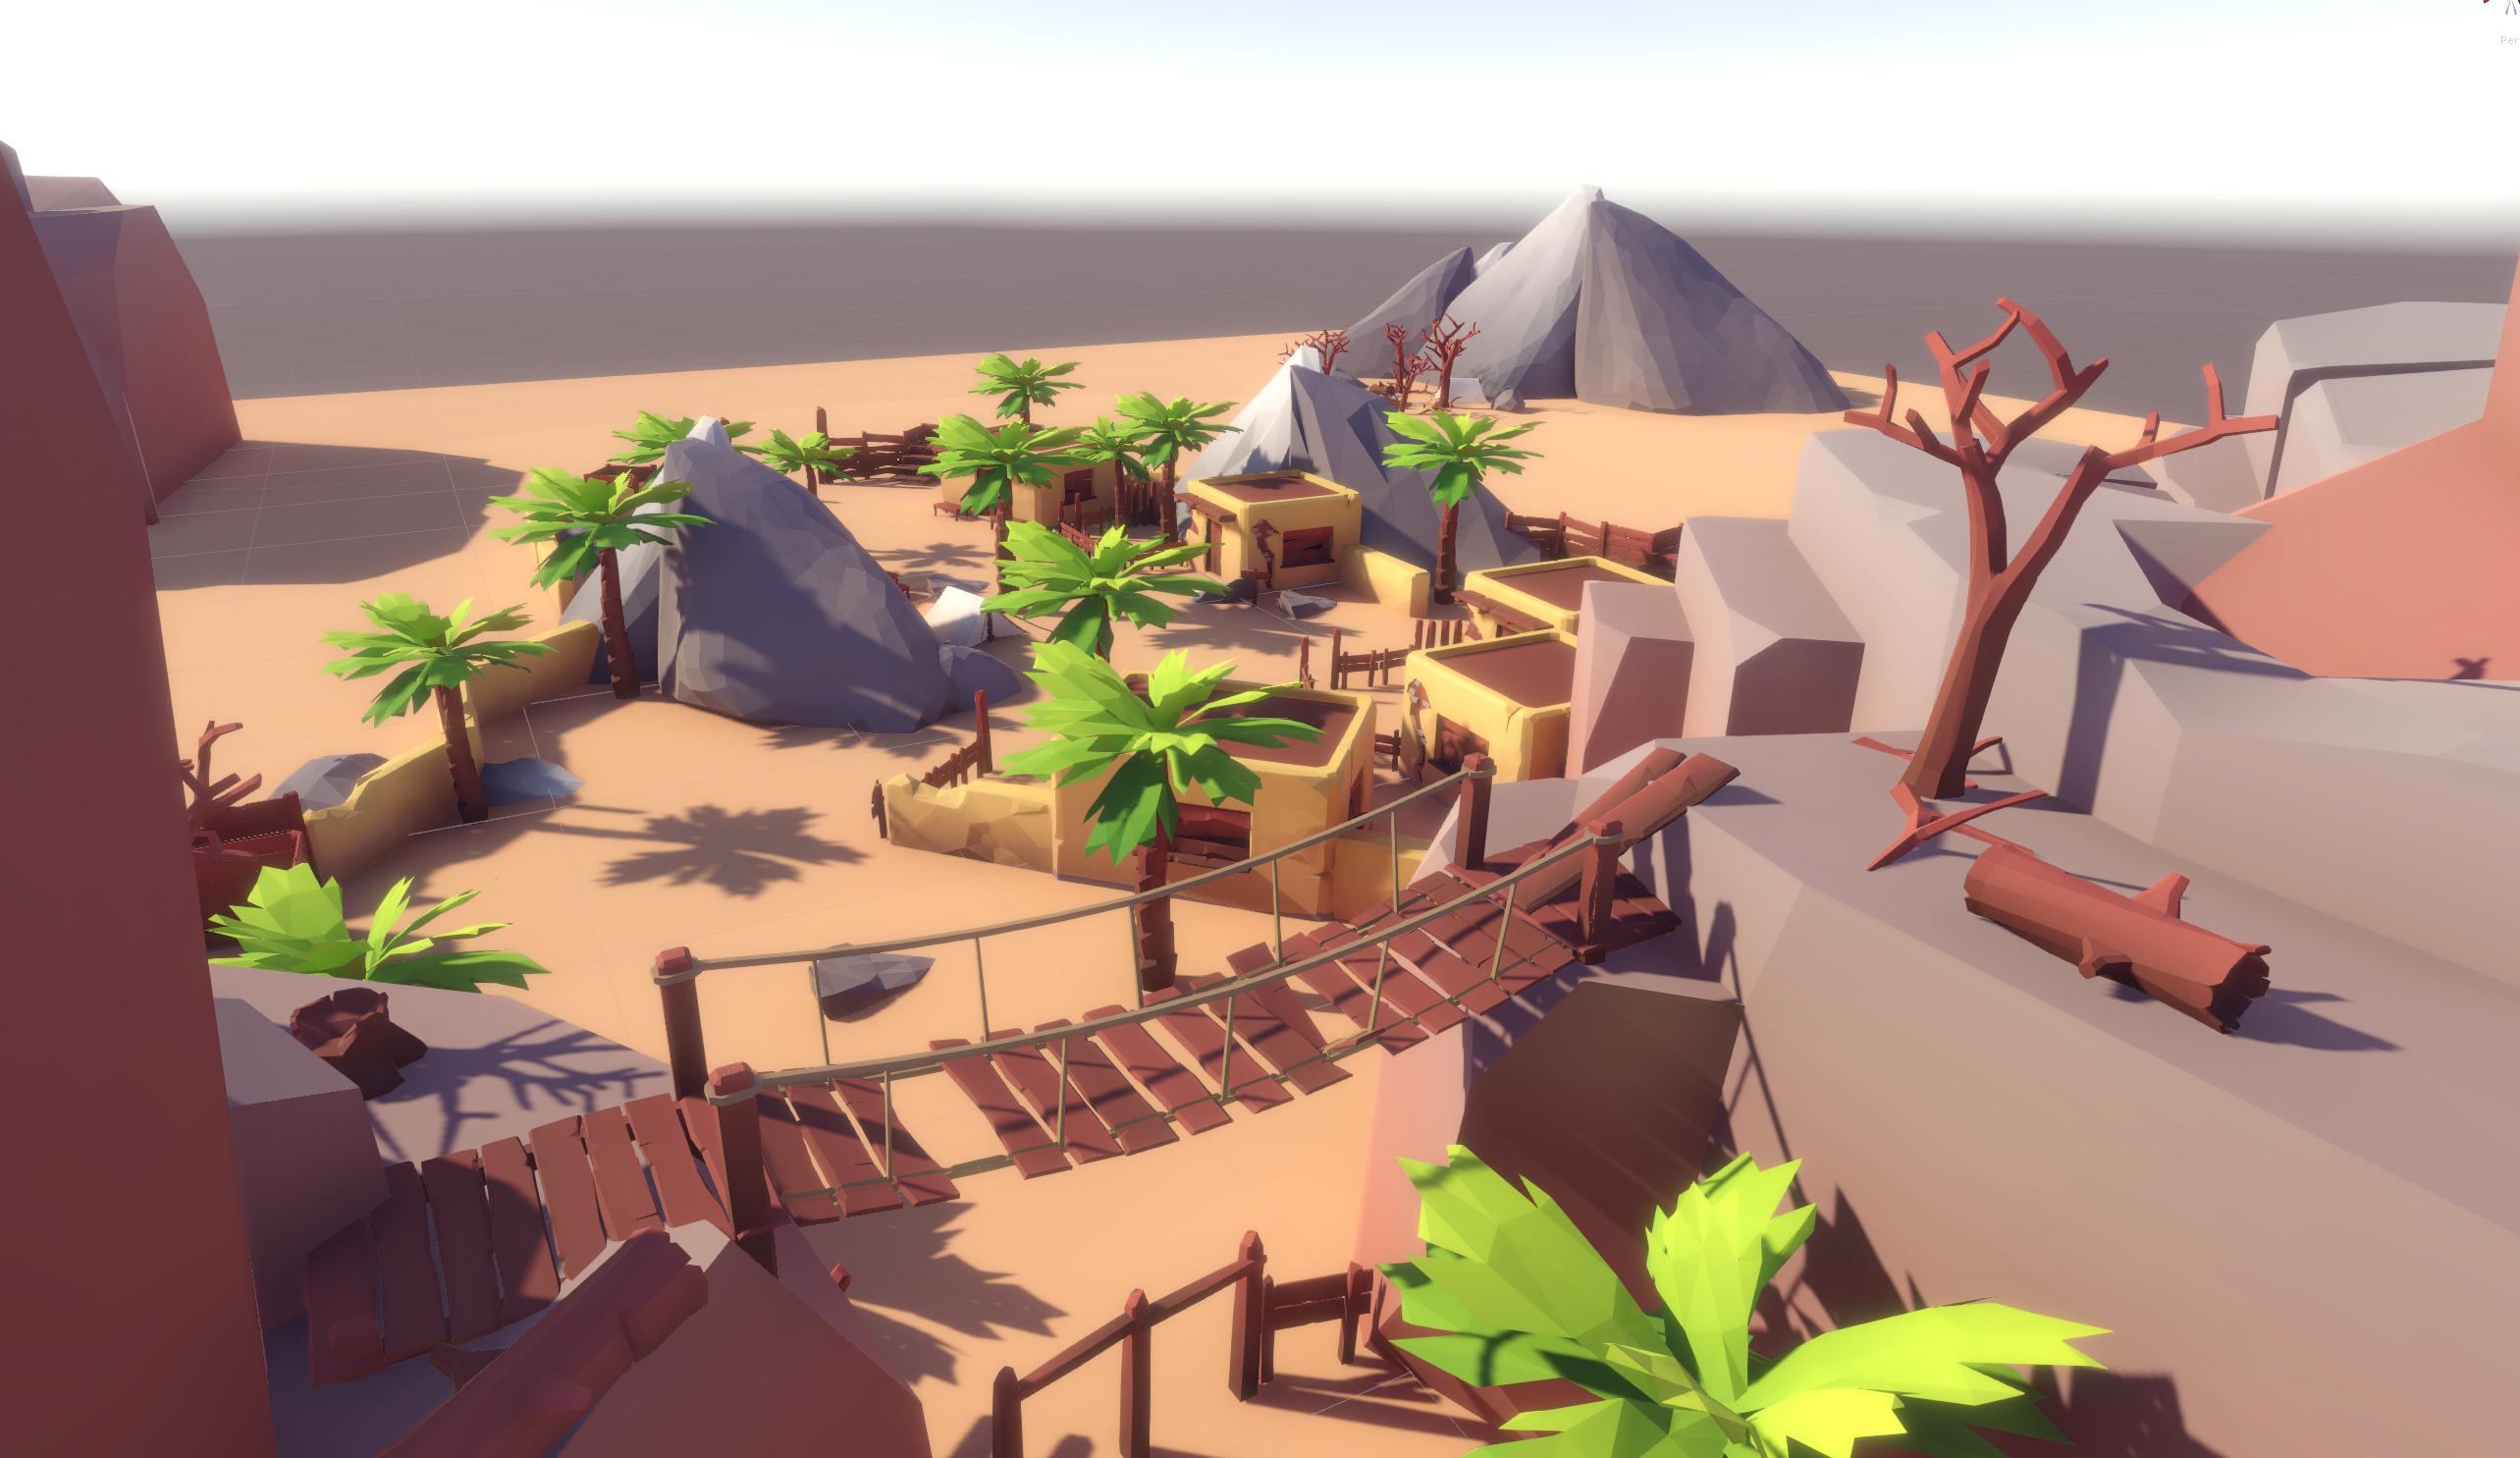 desert3.PNG